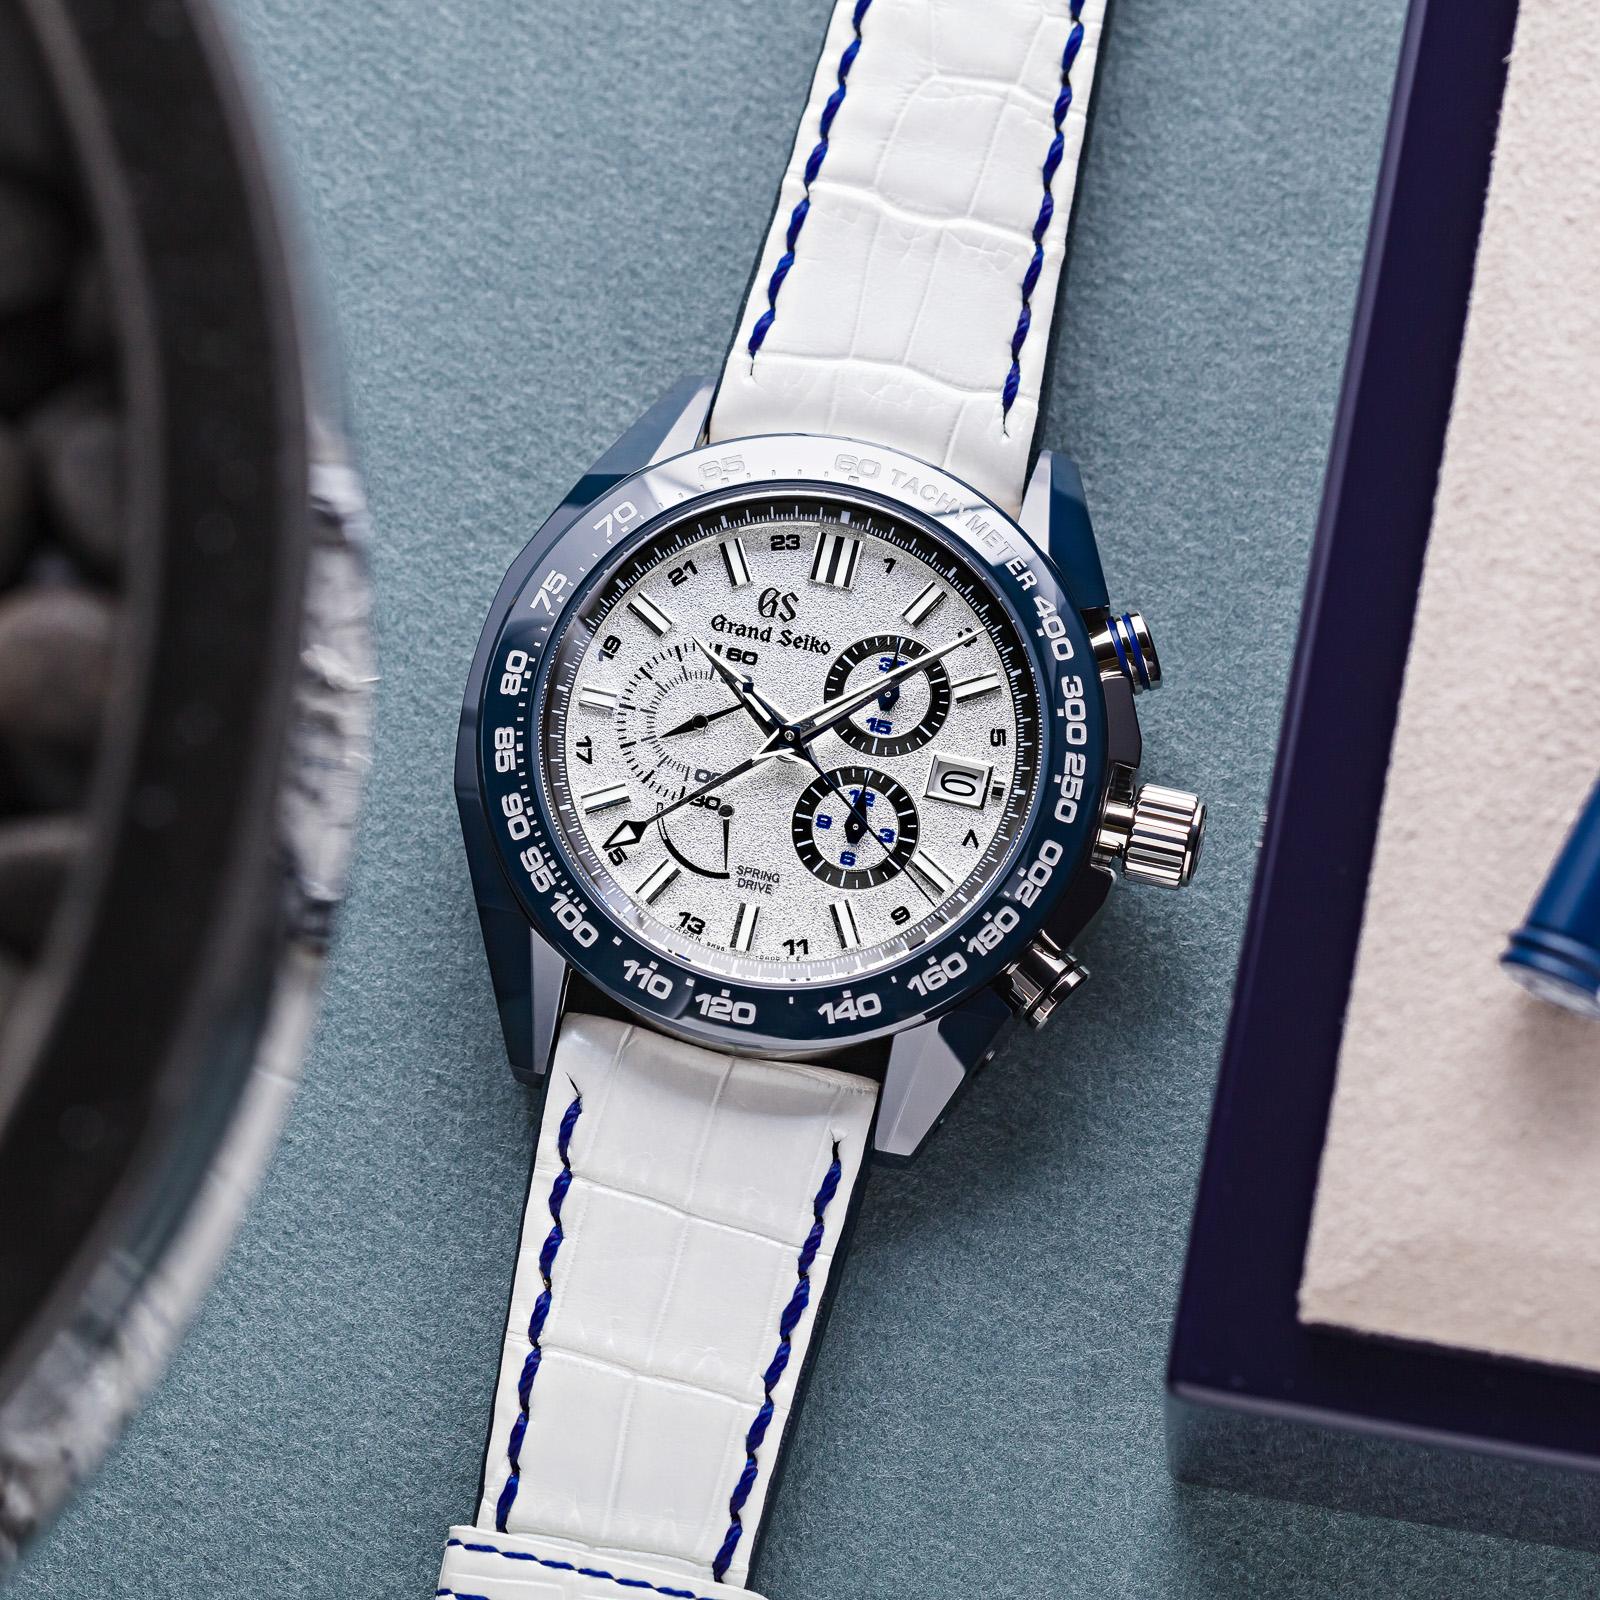 Grand Seiko Chronograph SBGC229 - a white dial wristwatch with a hybrid blue ceramic and titanium case.